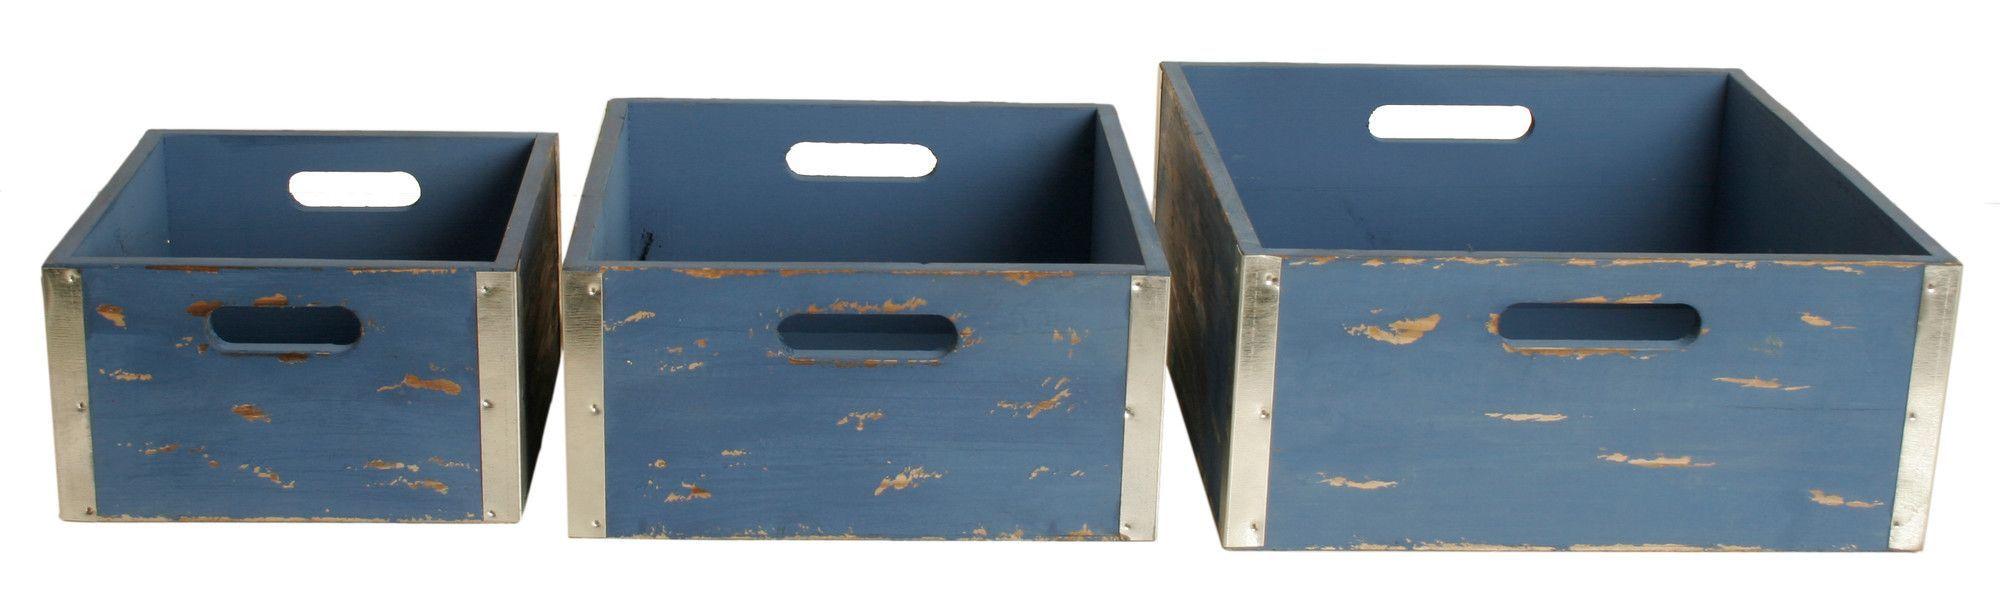 3 Piece Wooden Crate Set